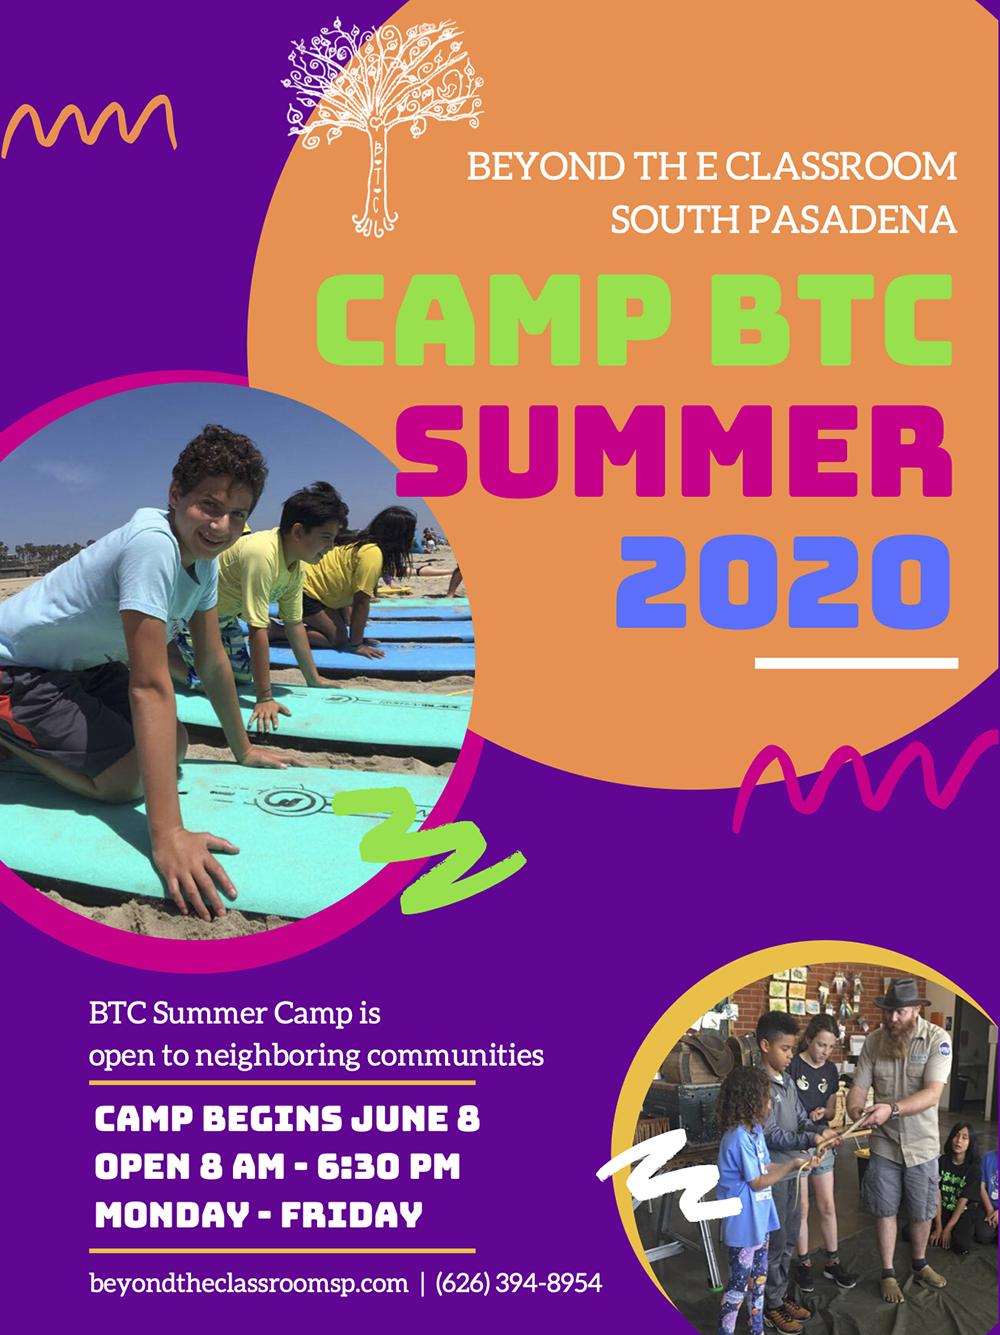 Beyond the Classroom Summer Camp 2019